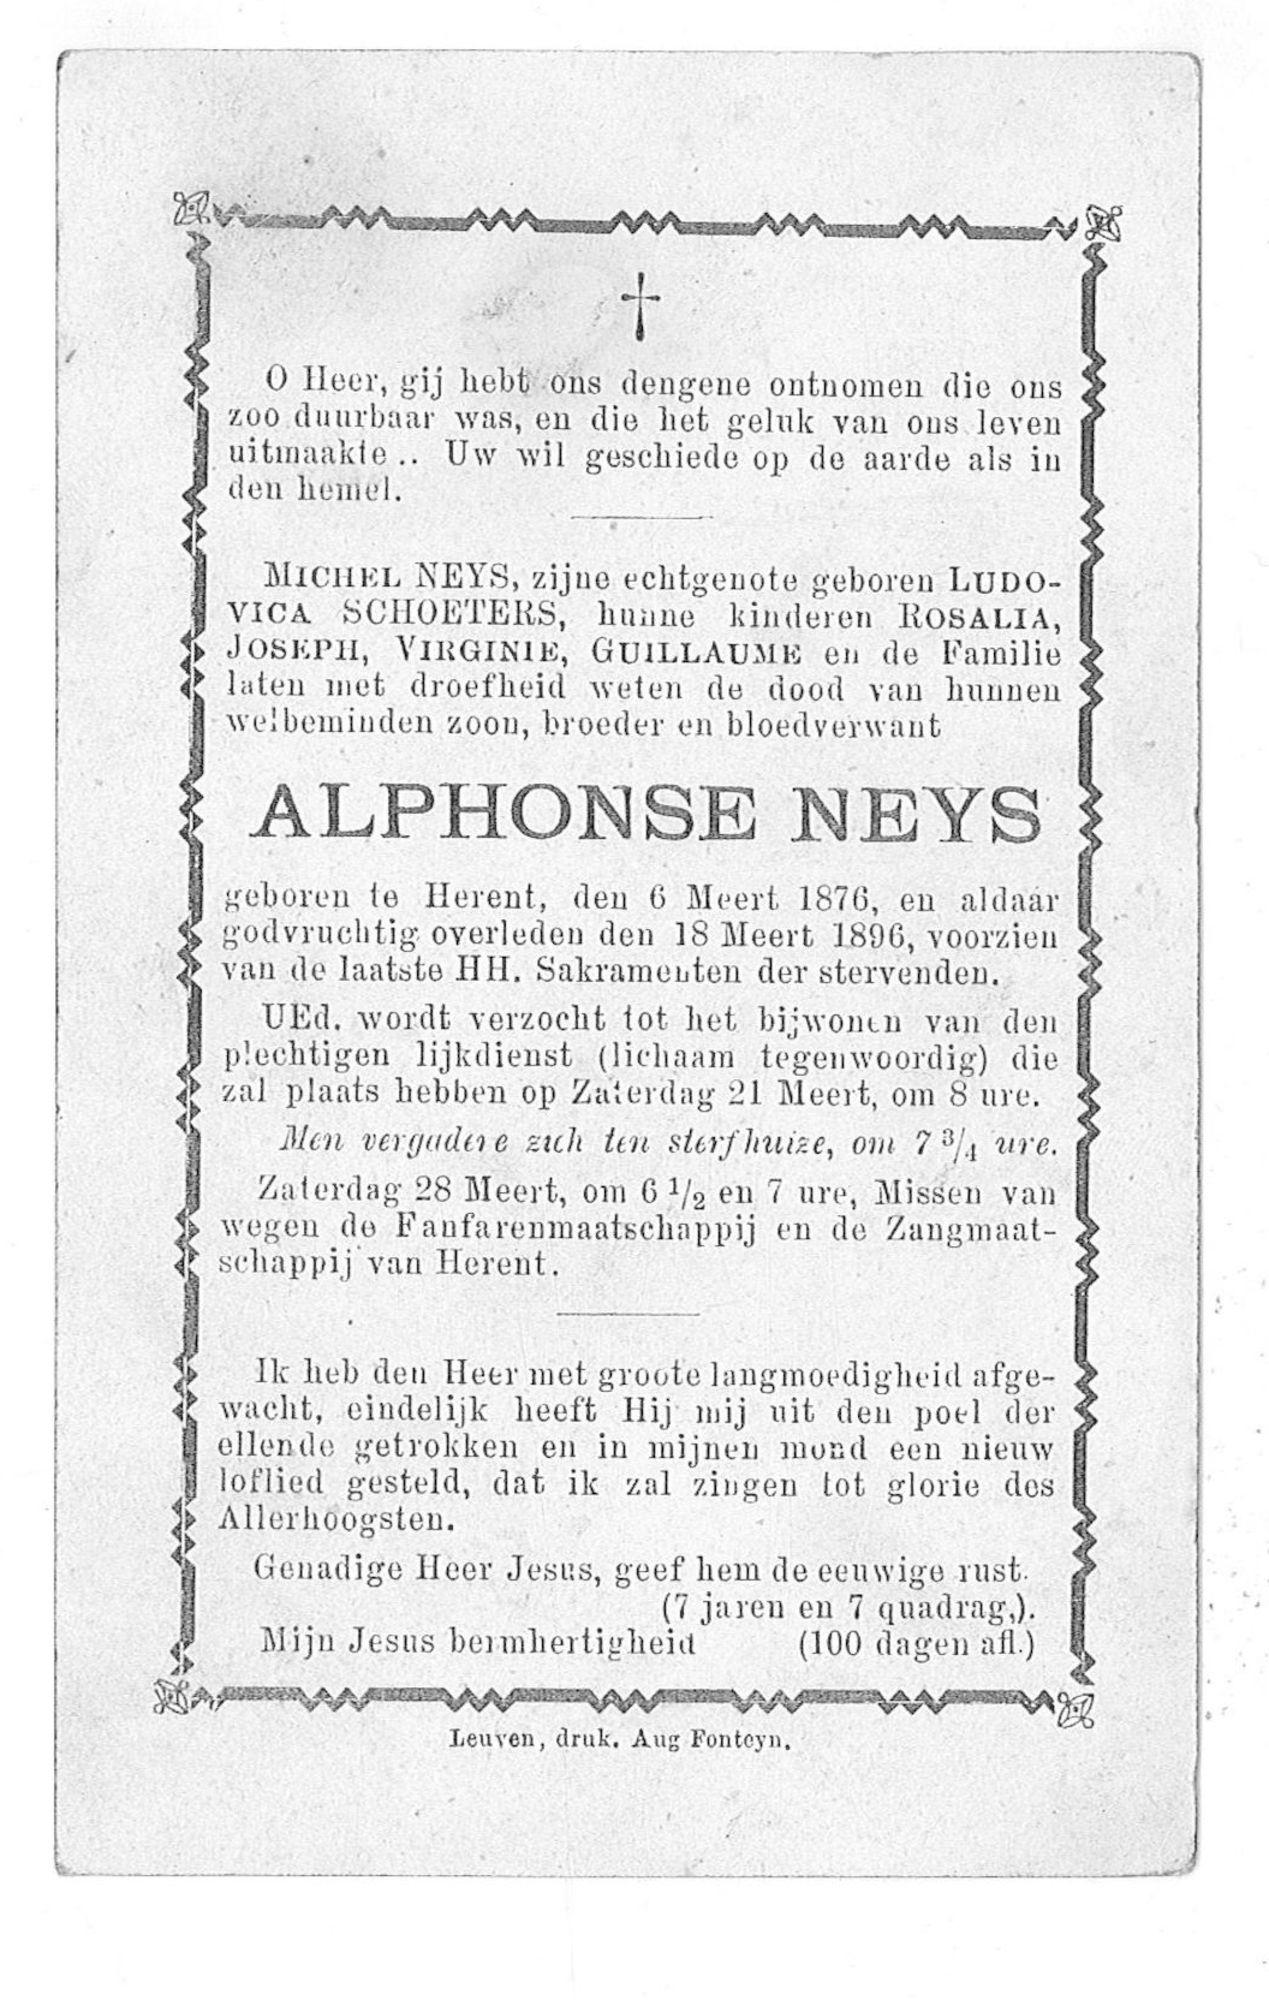 Alphonse Neys